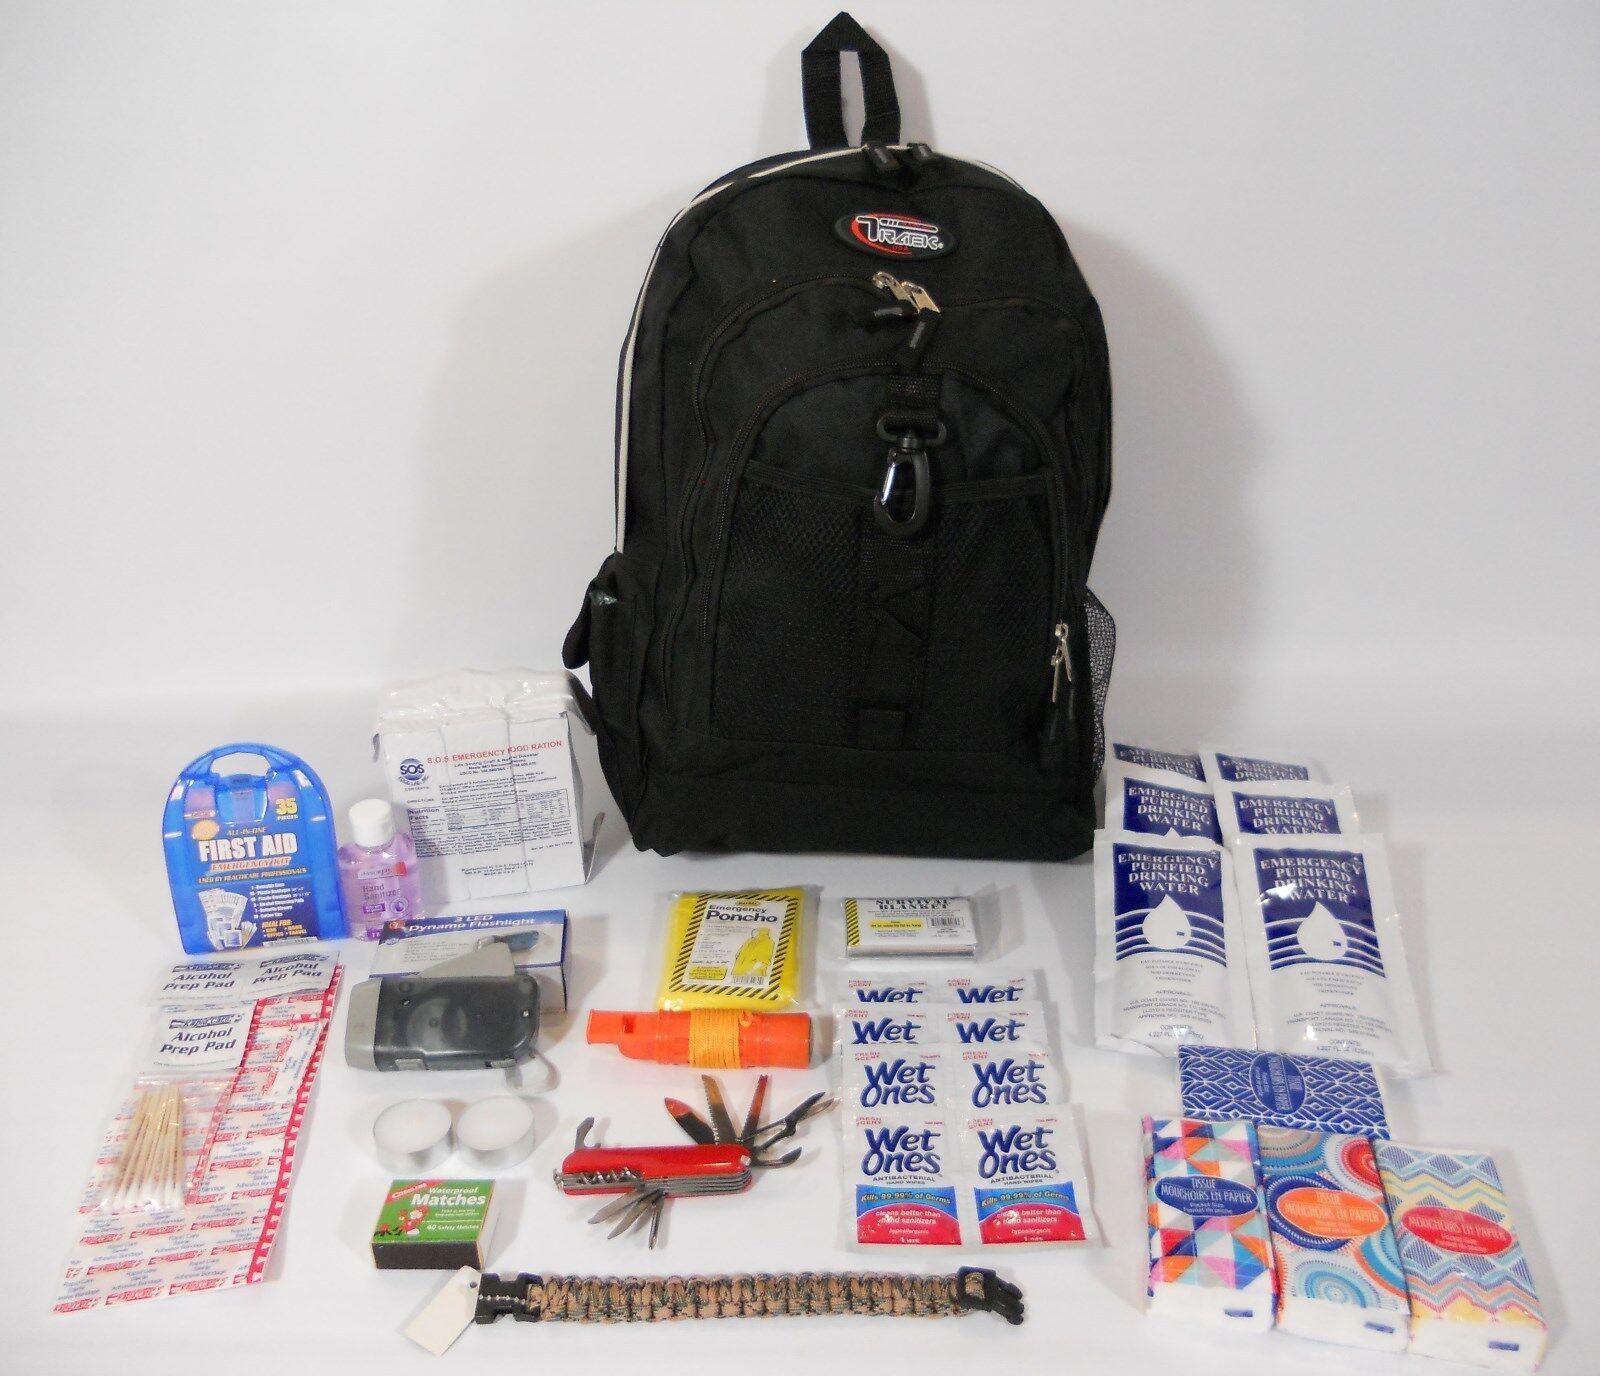 72 Hour Emergency Preparedness Kit Disaster Survival Earth Quake Zombie2  BOB  fitness retailer